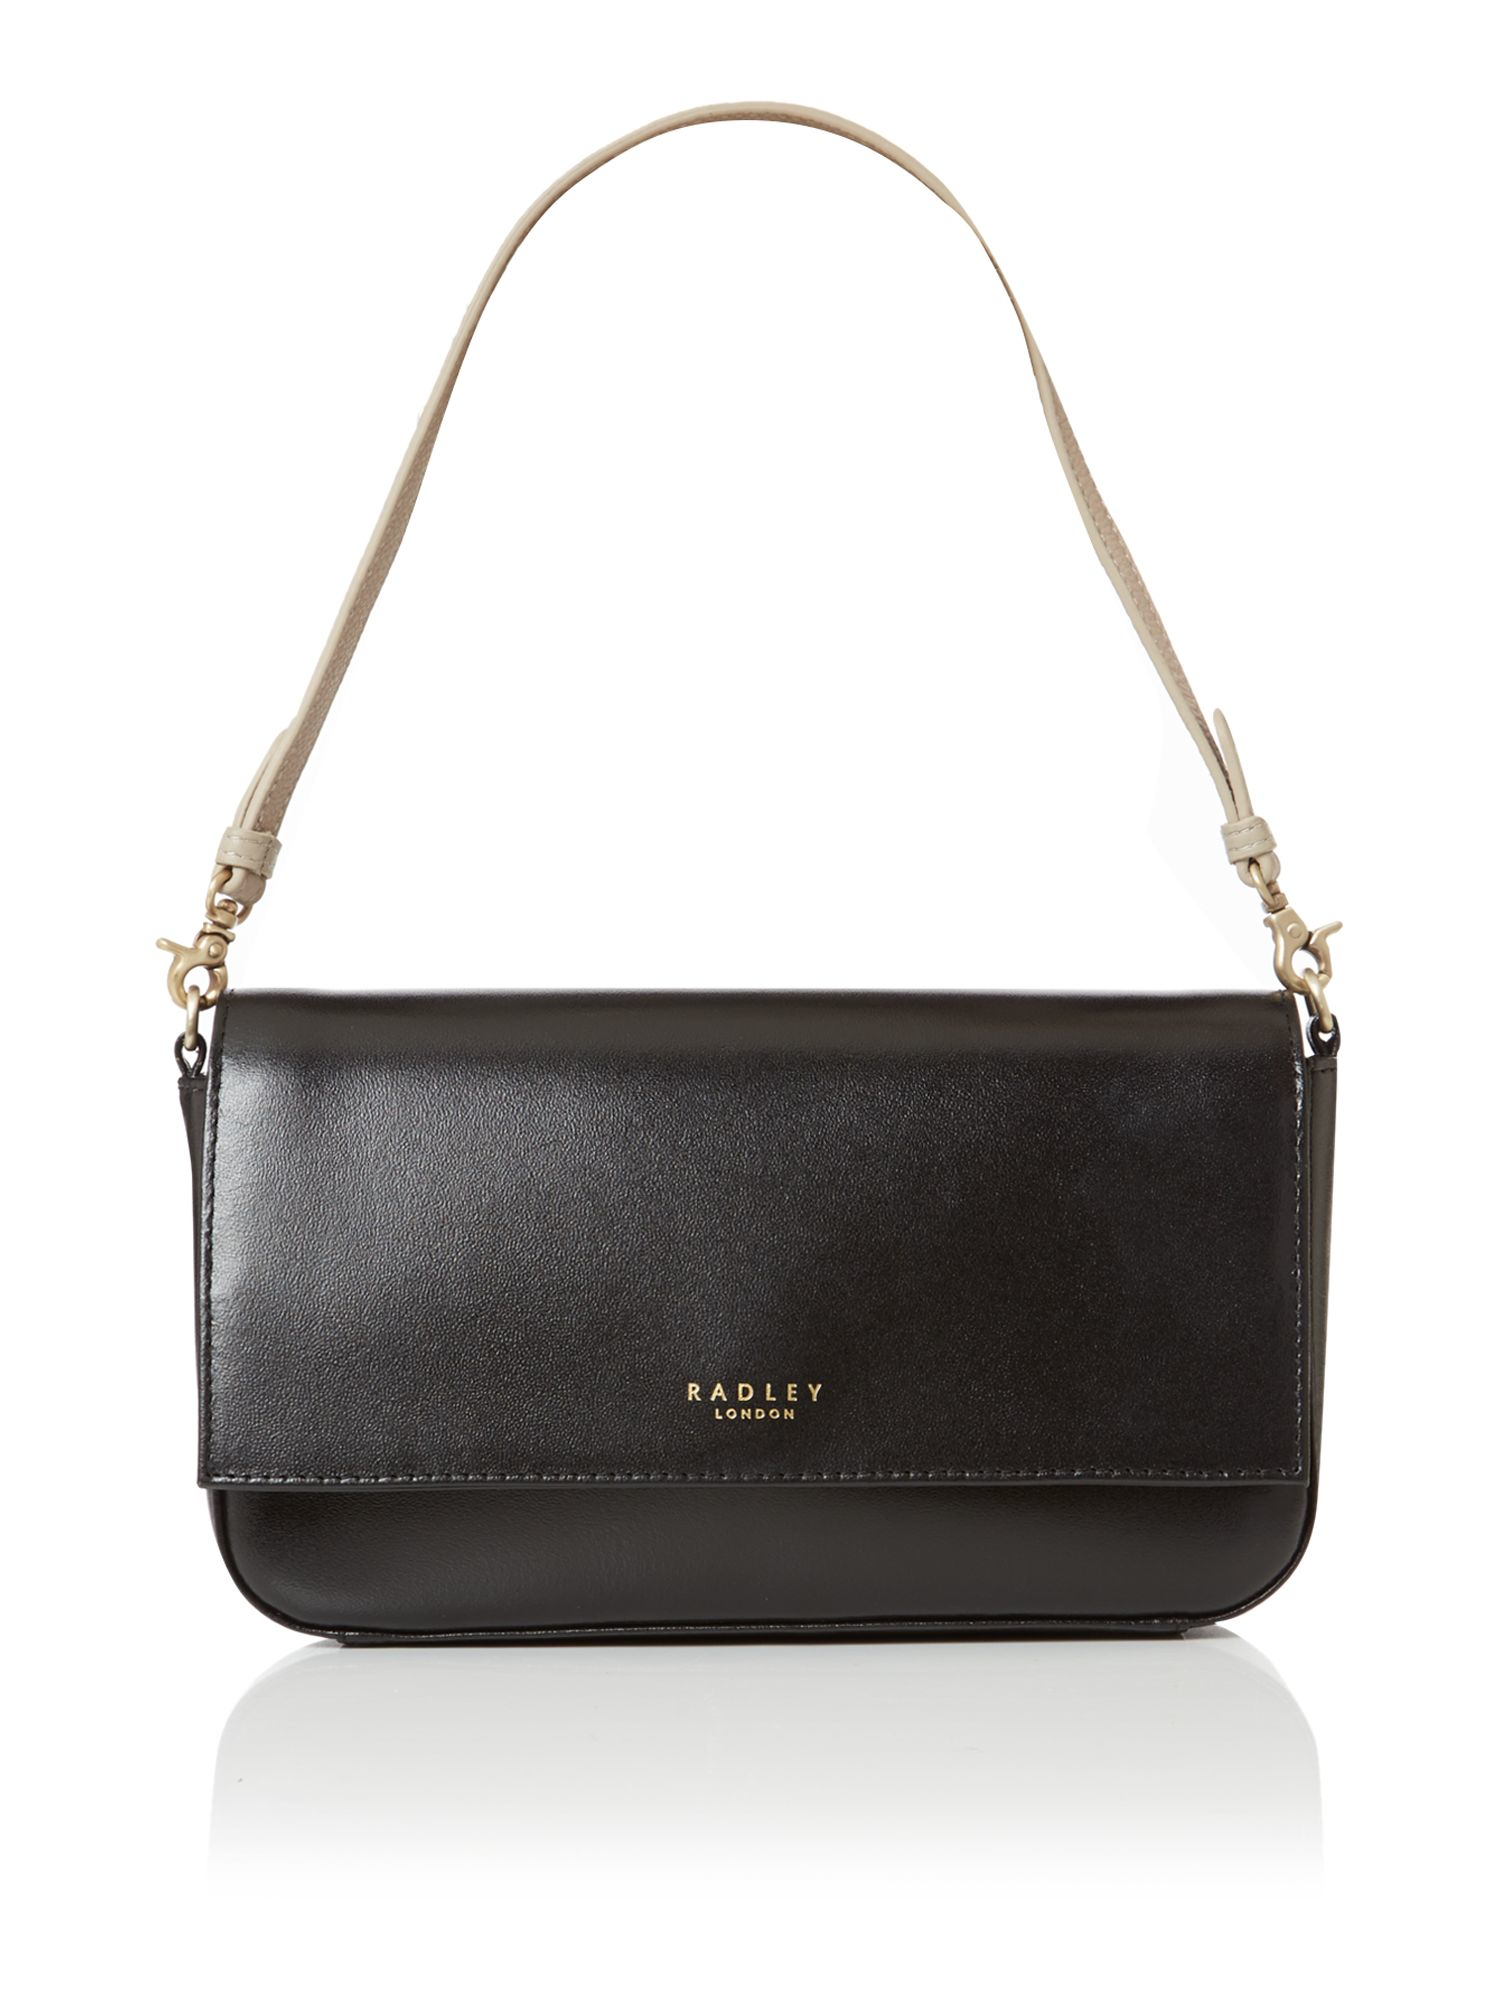 Radley Hepburn Small Black Flapover Shoulder Bag in Black | Lyst